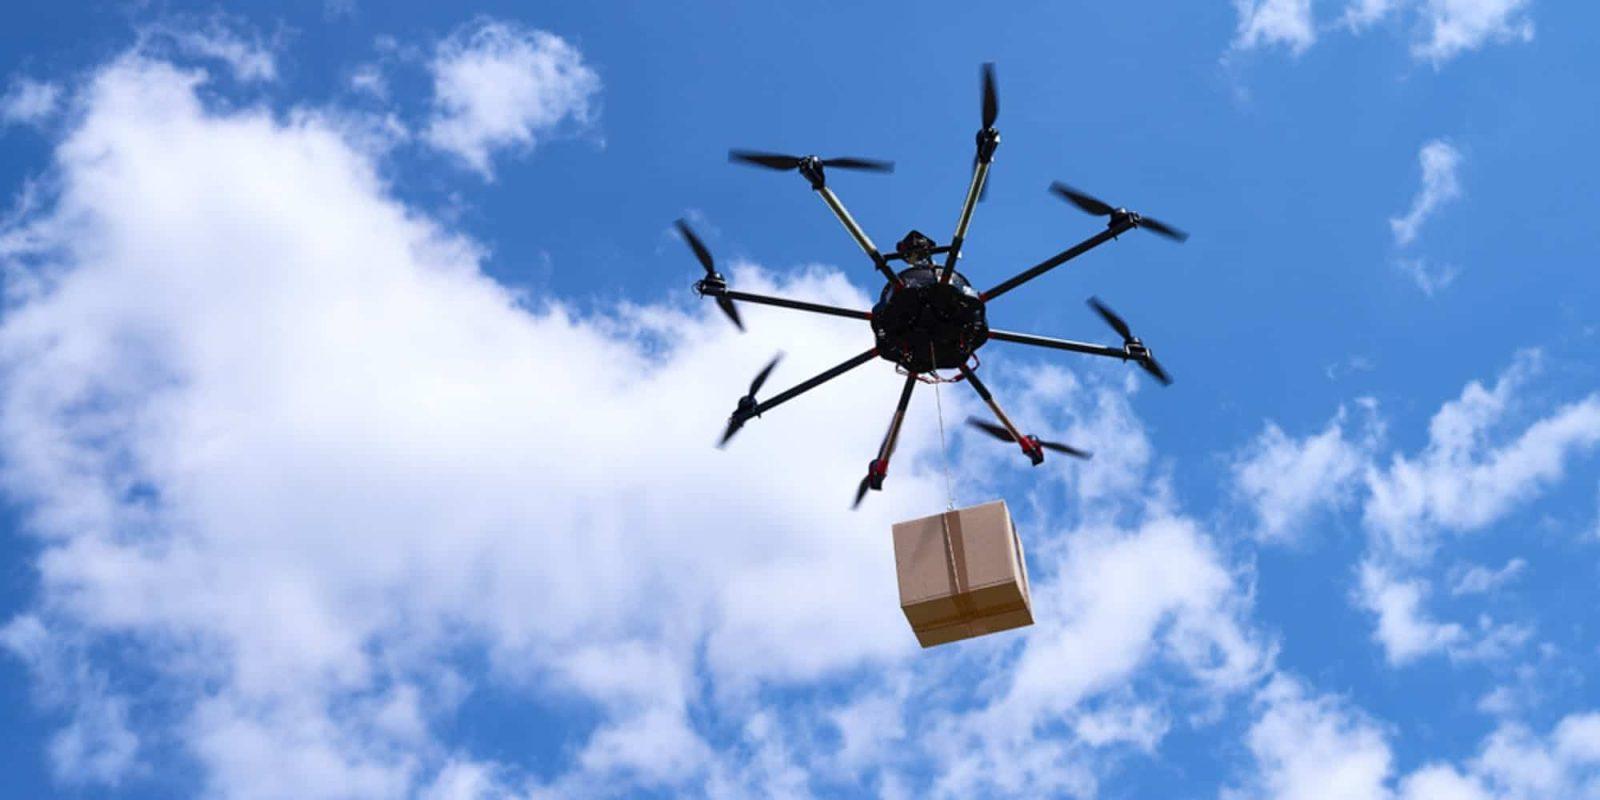 Horizon Hobby Chroma Drone Review